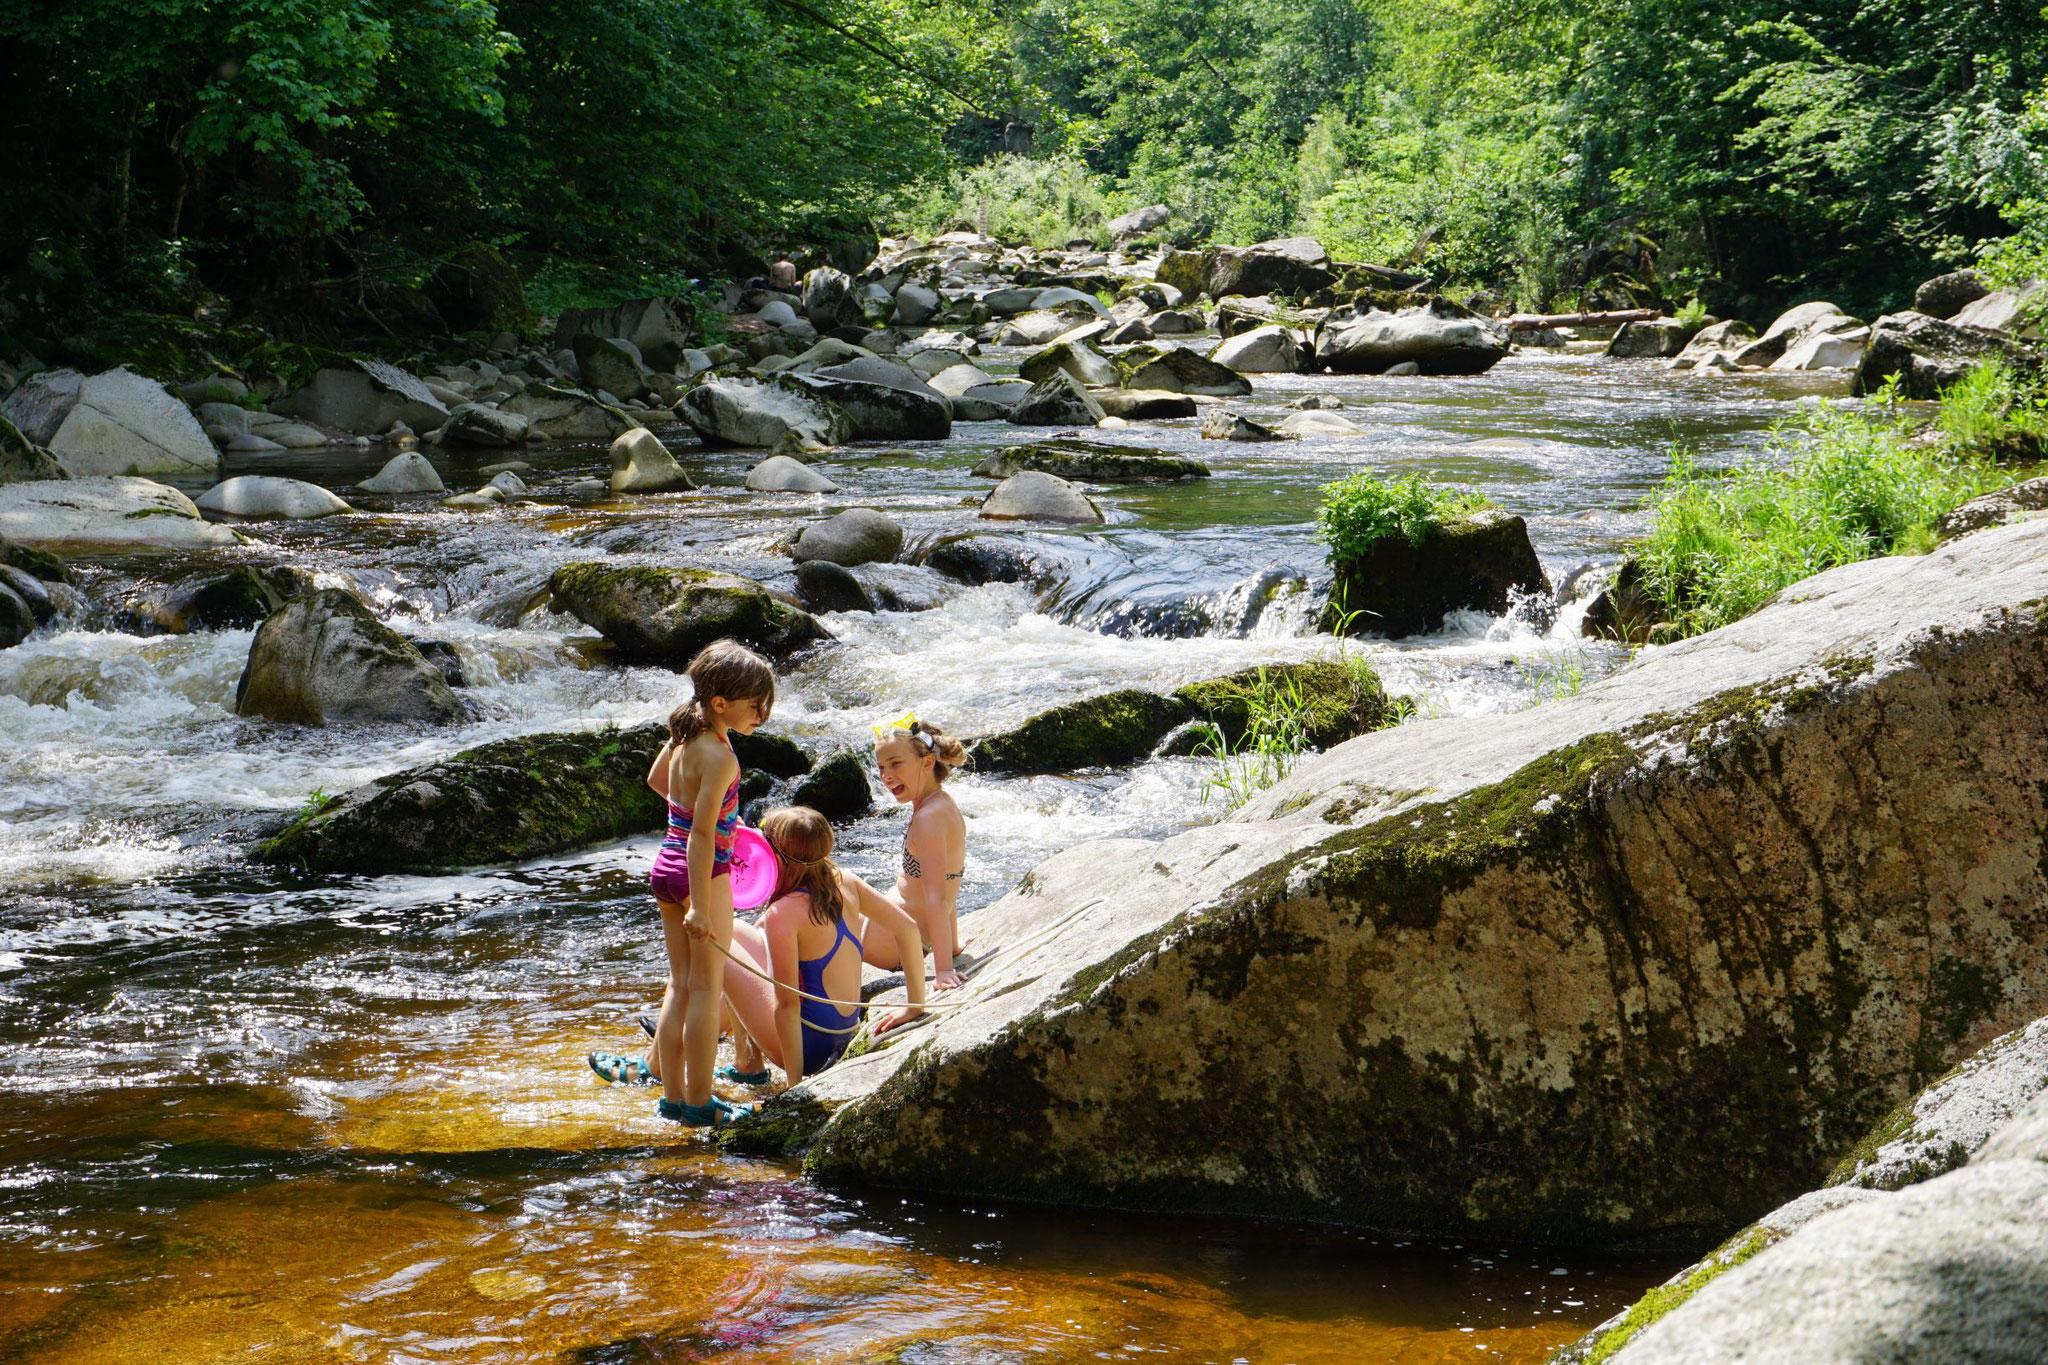 Im Flussbett der Murg bei Forbach